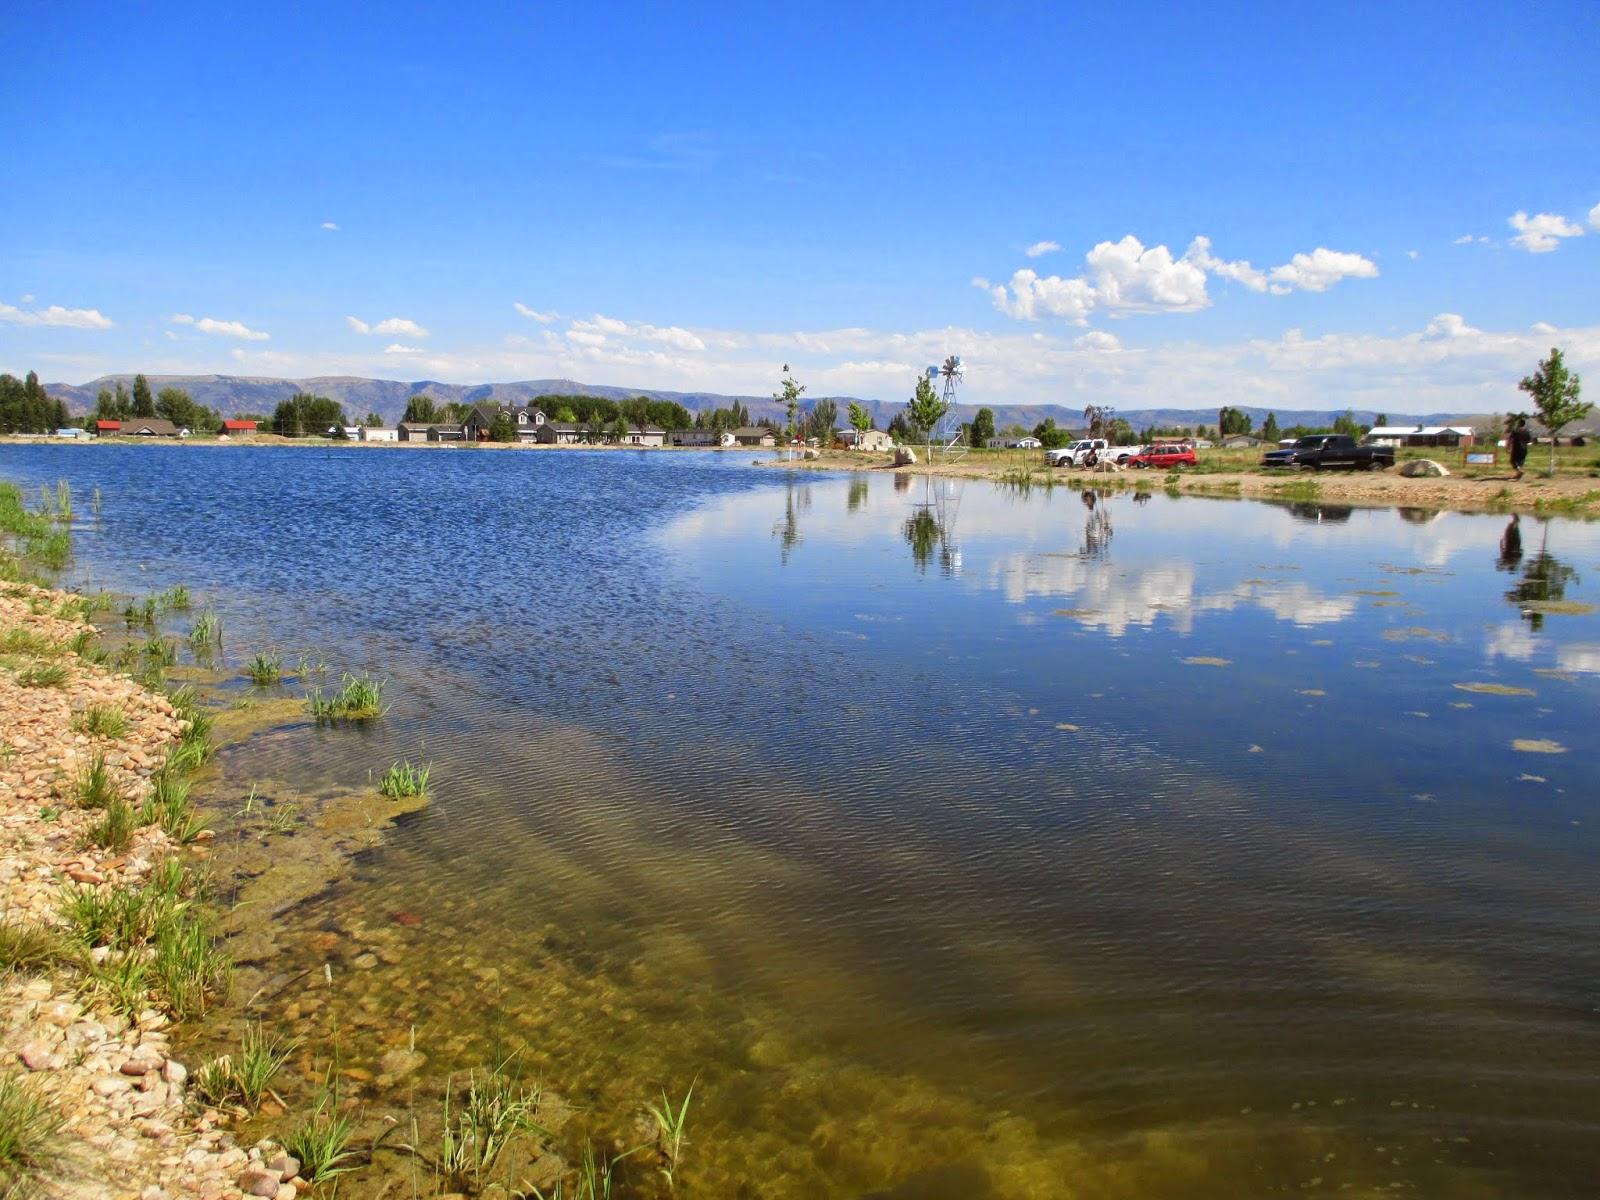 backyard excursions heritage park community fishing pond